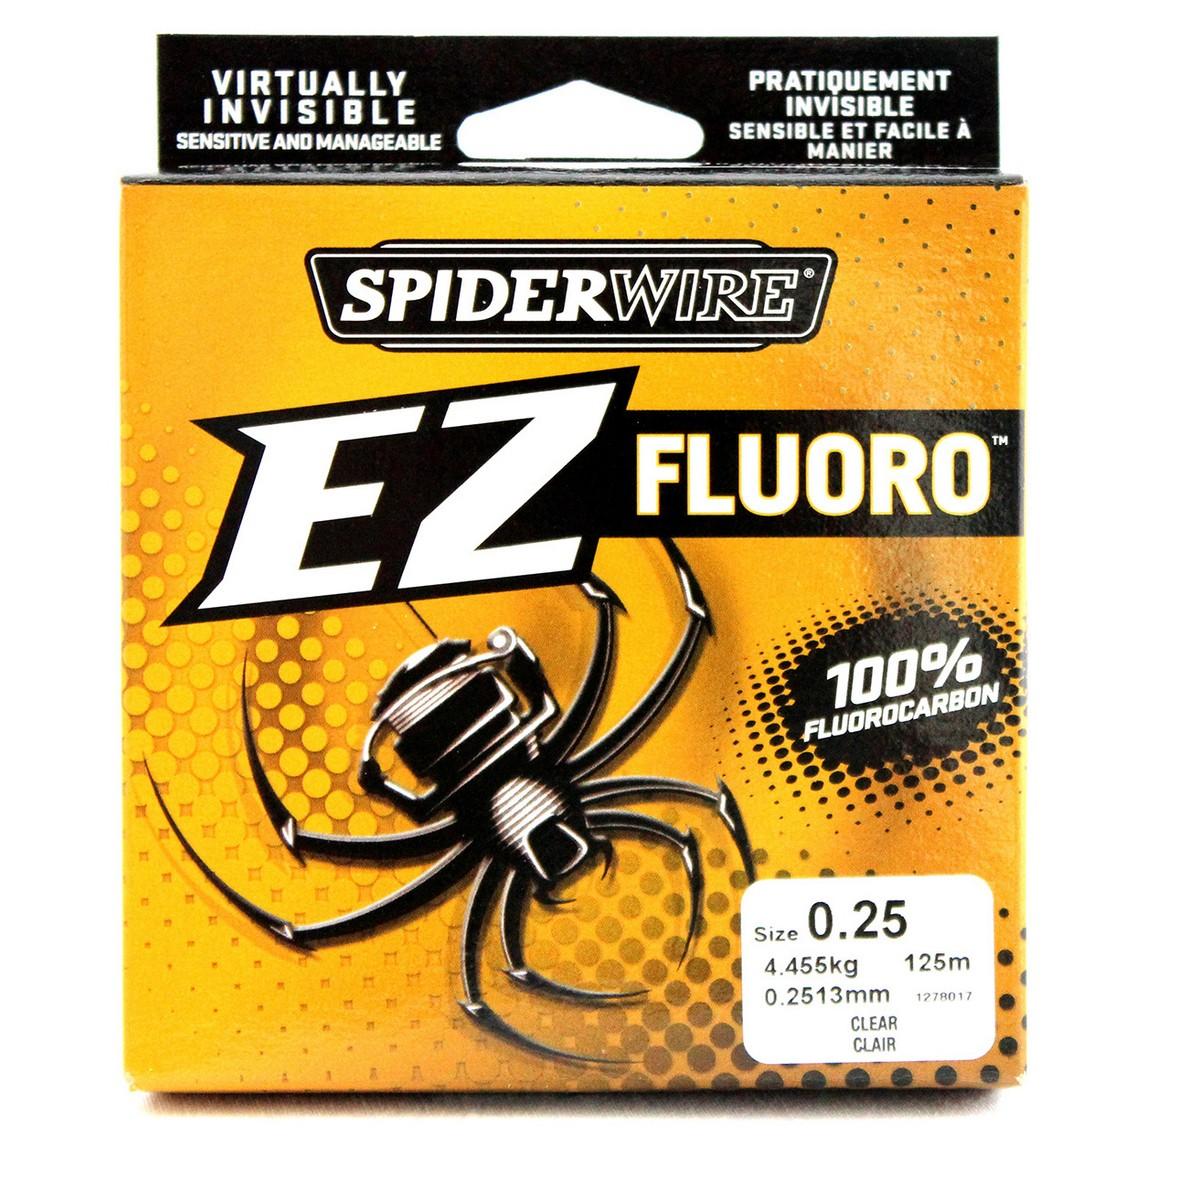 Spiderwire EZ Fluoro 125m-0